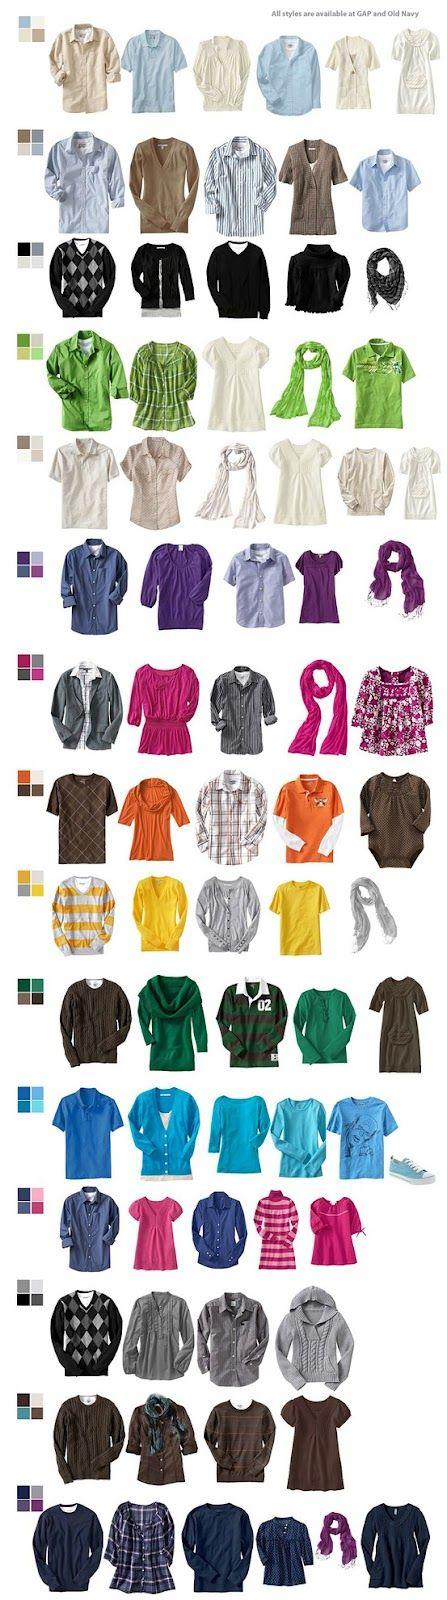 Family Portrait Clothing Ideas   blog: Fall Portrait Clothing Ideas {San Antonio Family Photographer}